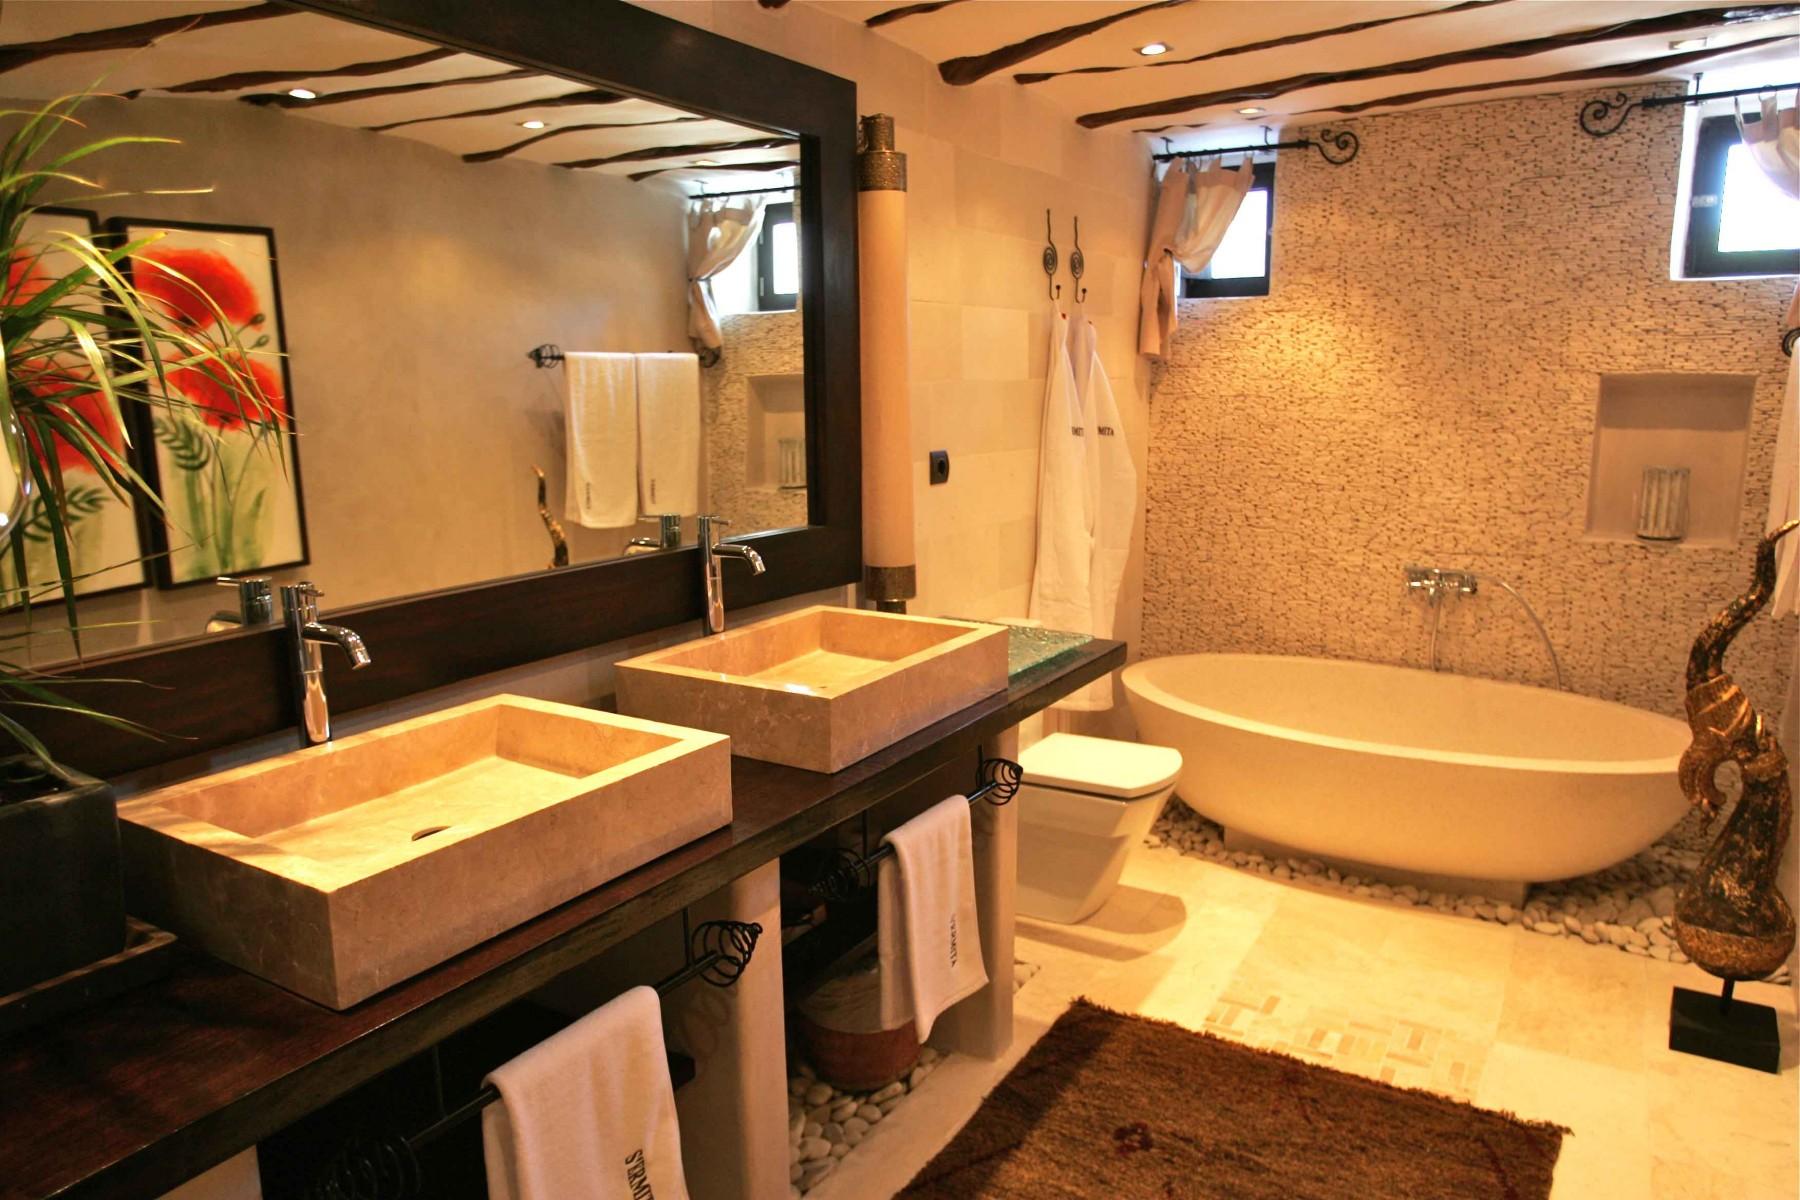 Beautiful Badkamer Ibiza Stijl Pictures - Huis & Interieur Ideeën ...